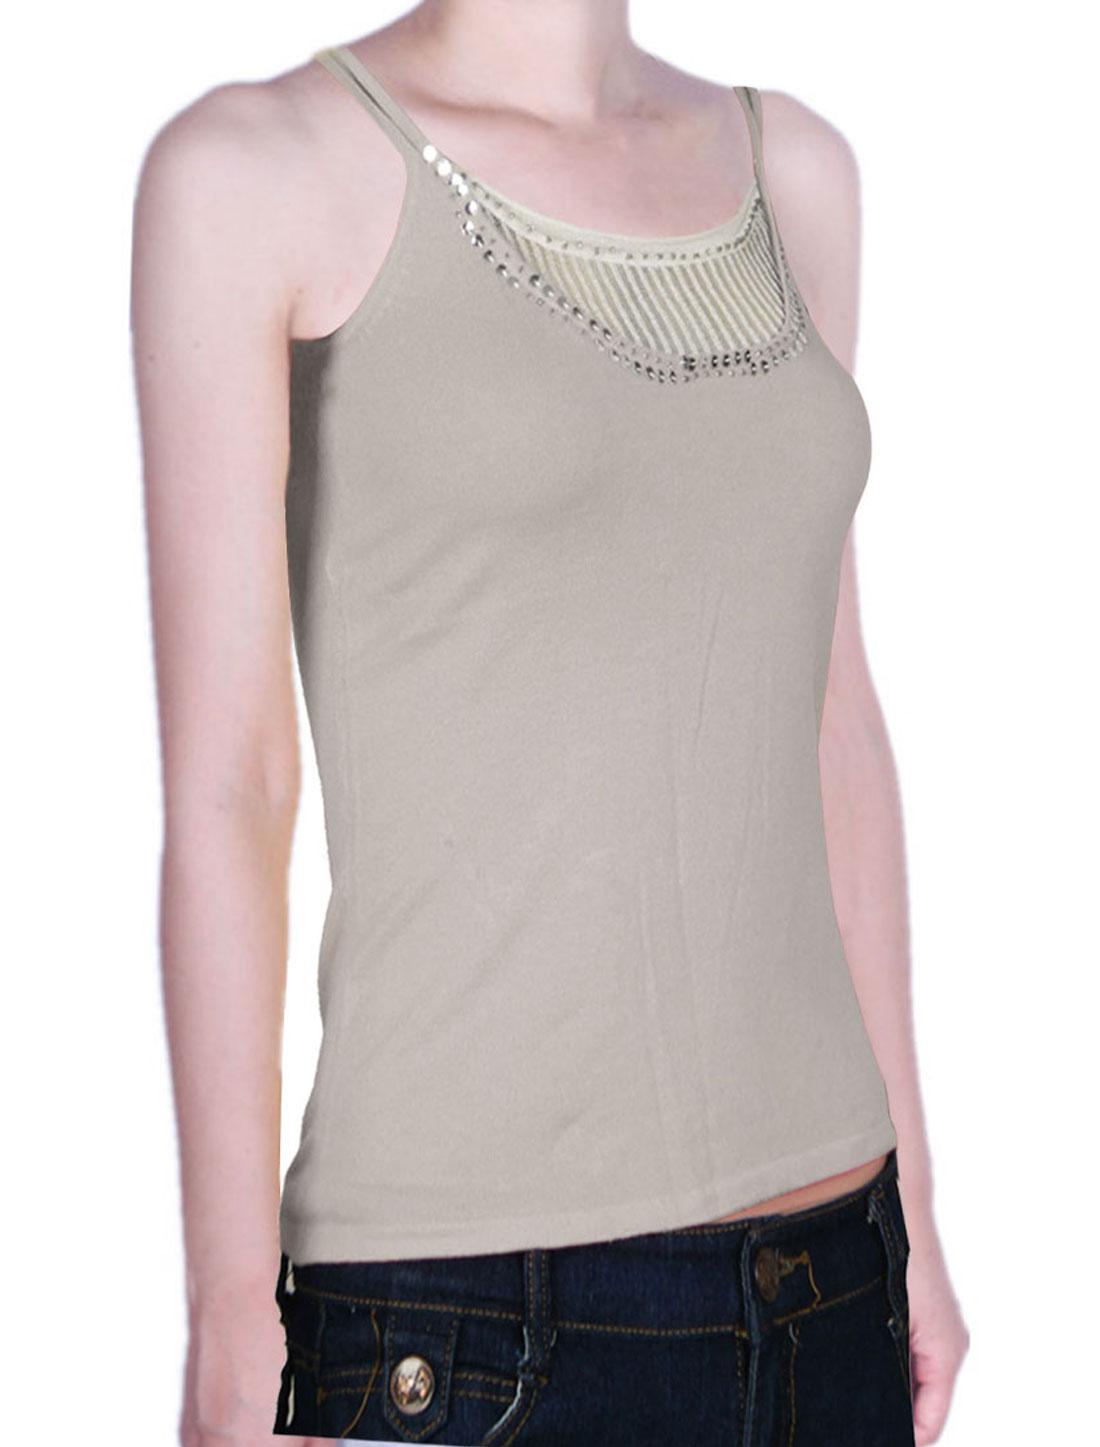 Women Bead Sequin Decor Double Strap Basic Tank Top Shirt Gray XS